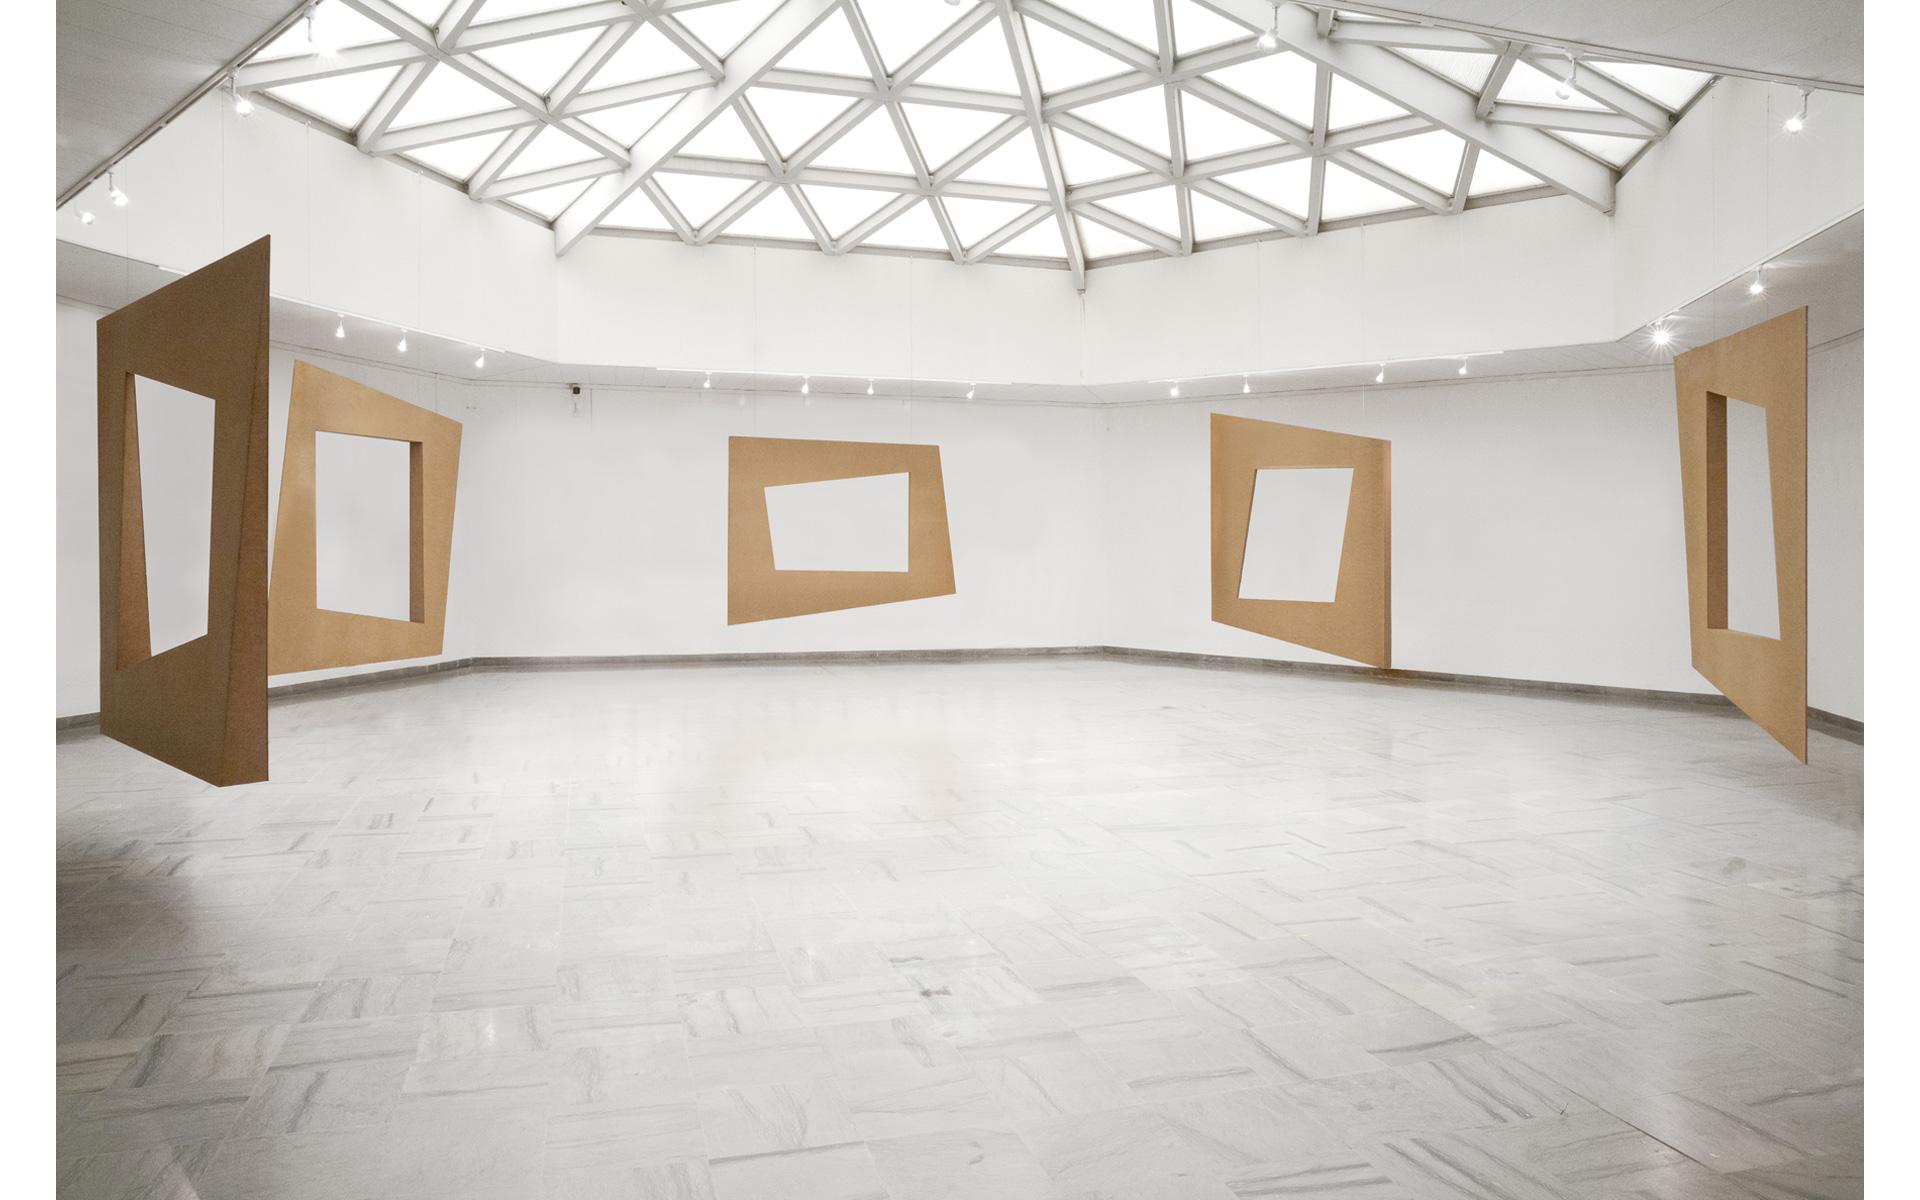 Installation view Fondation Vasarely, Aix-en-Provence, 2011